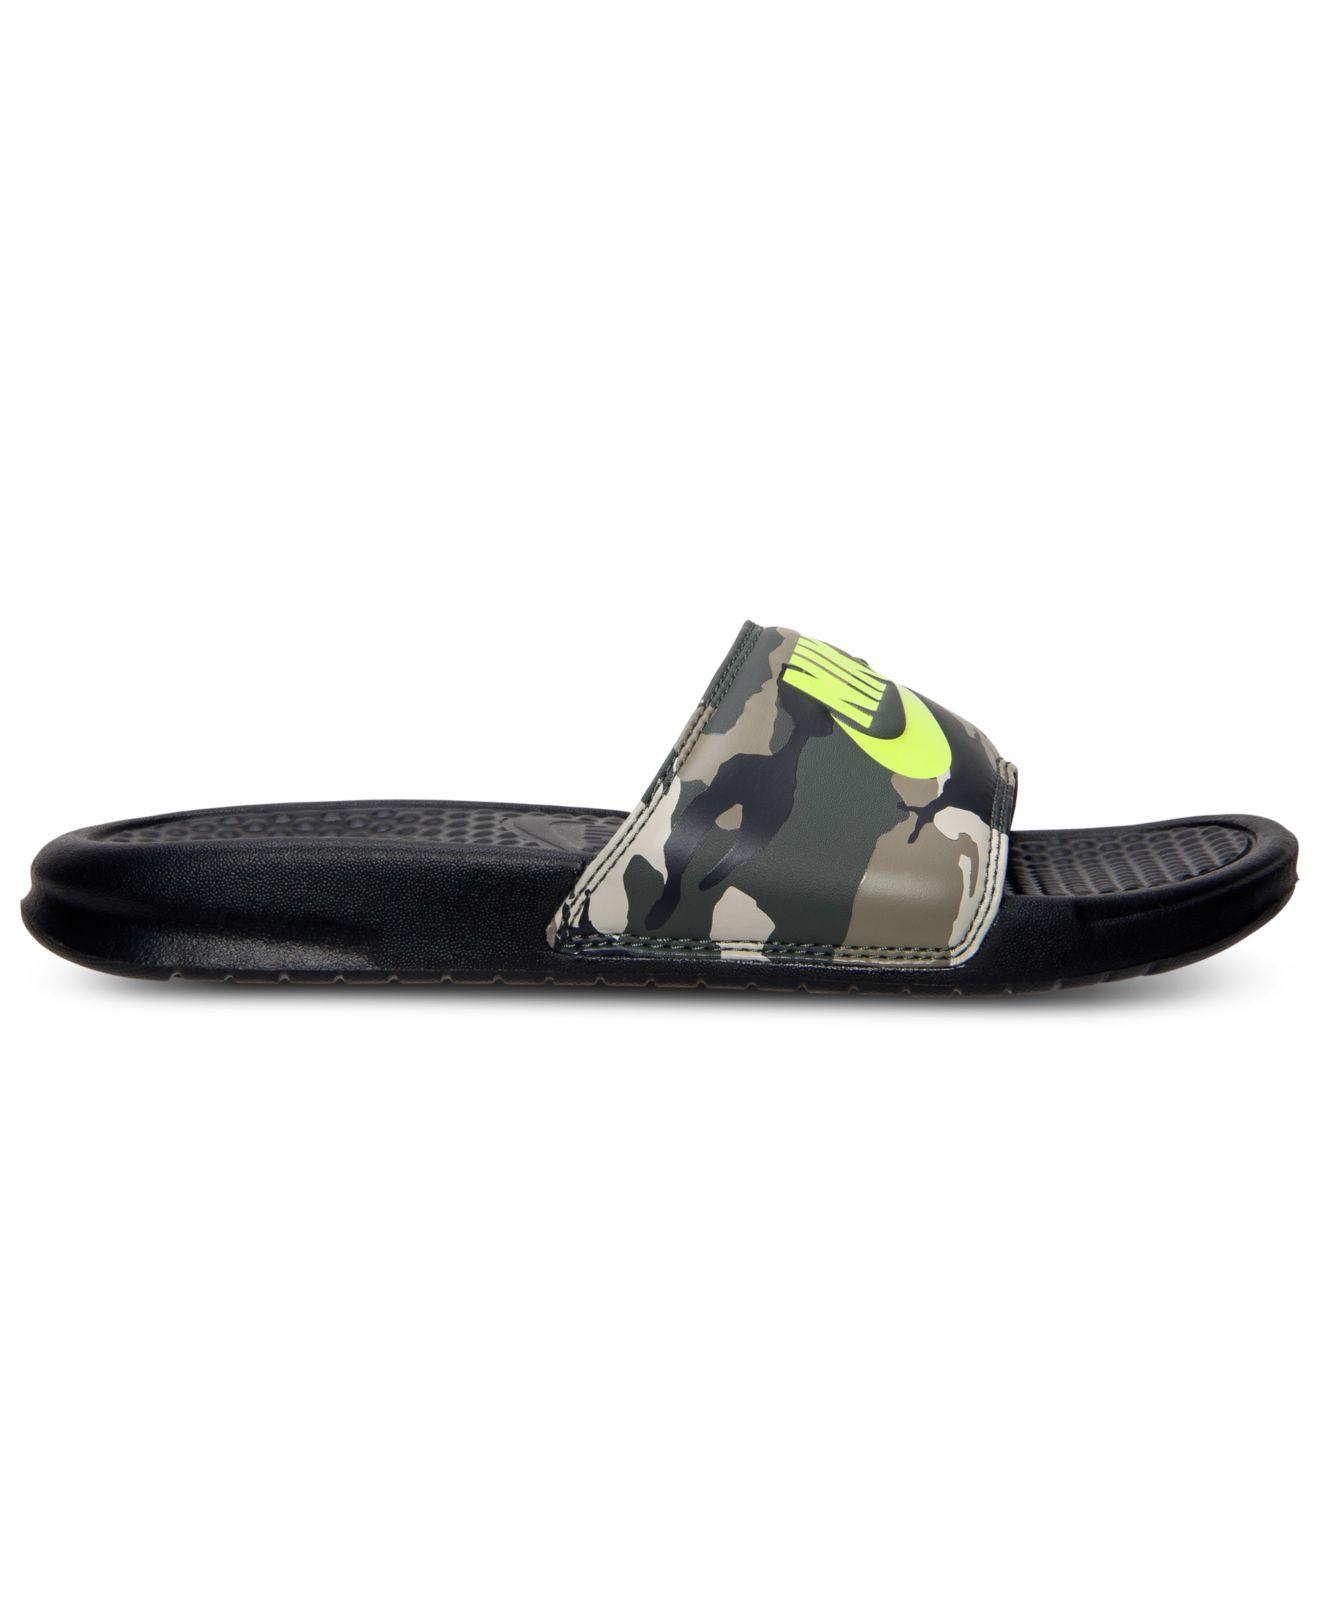 775f5580eb4 ... cheap lyst nike mens benassi jdi print slide sandals from finish line  5c4a1 8652e